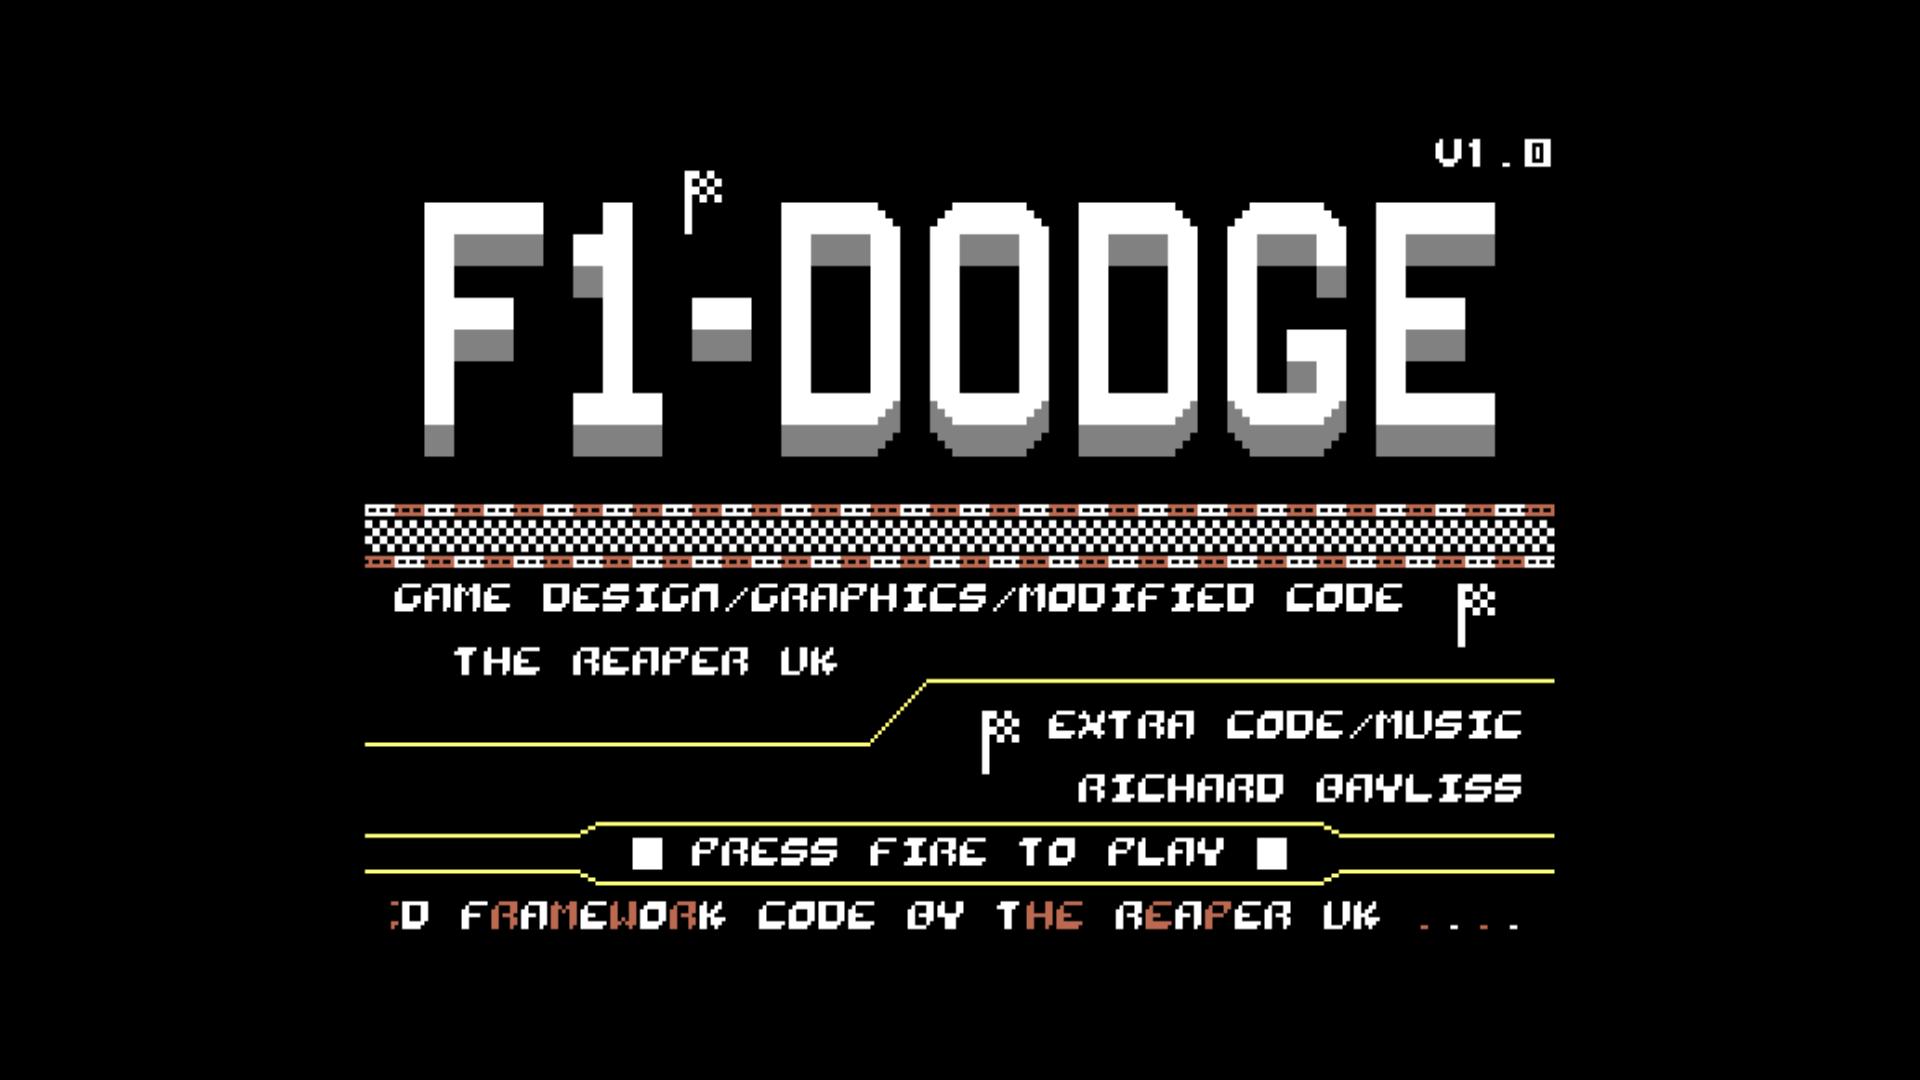 F1-Dodge (C64)